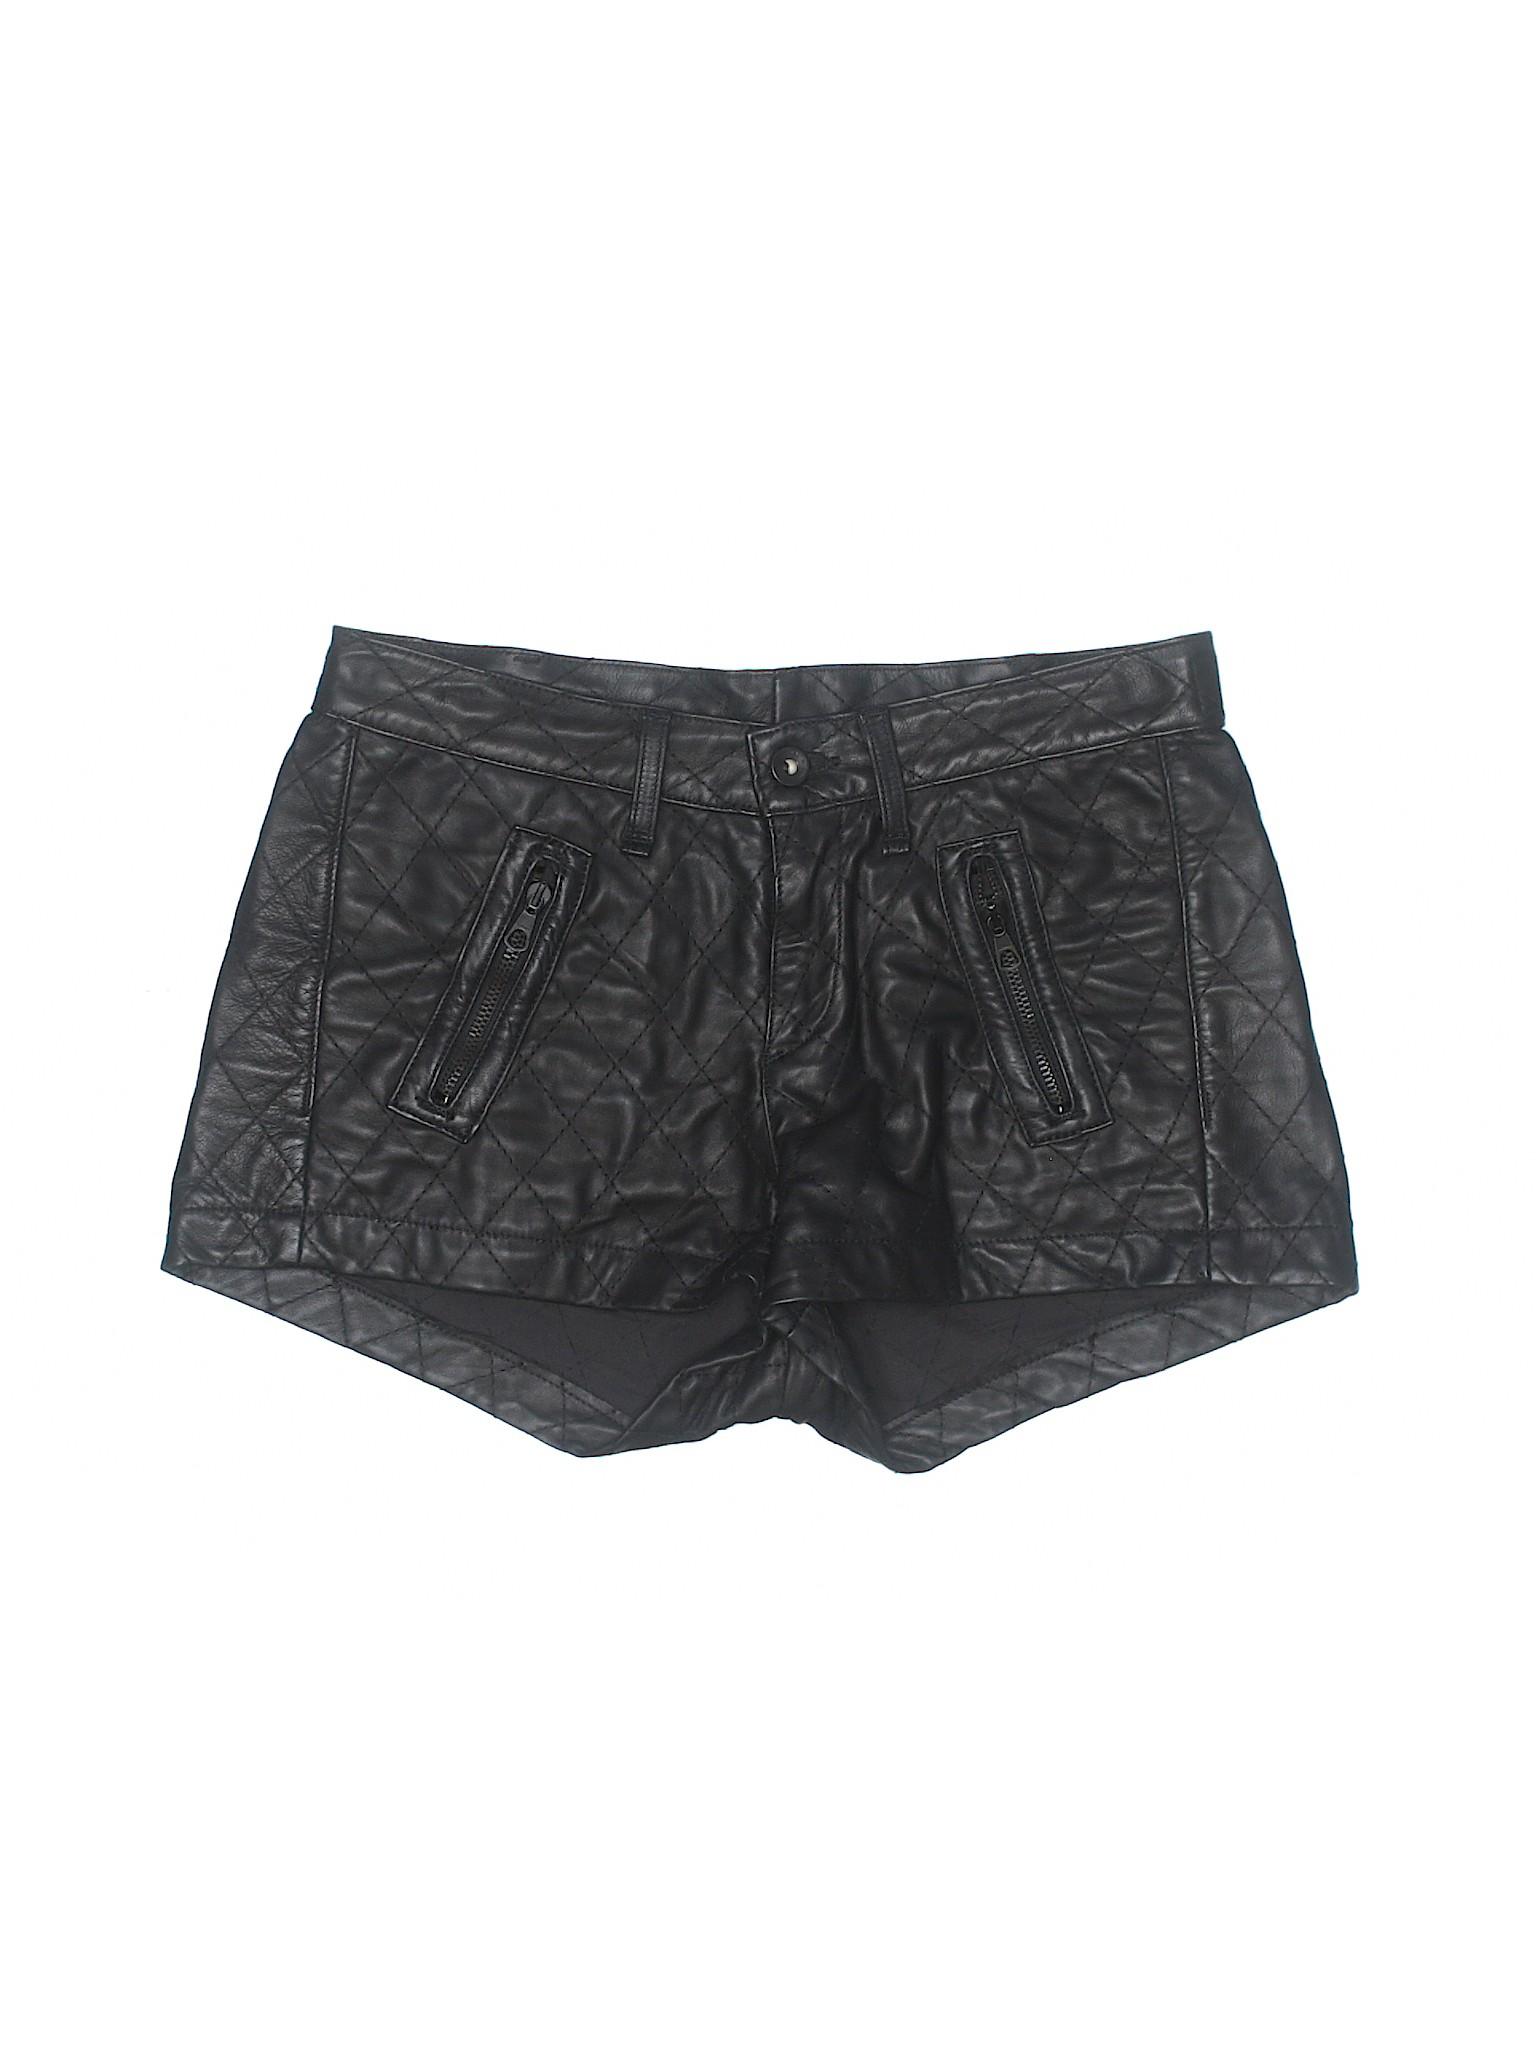 Boutique Leather Bone Shorts amp; Rag 1rwR1p